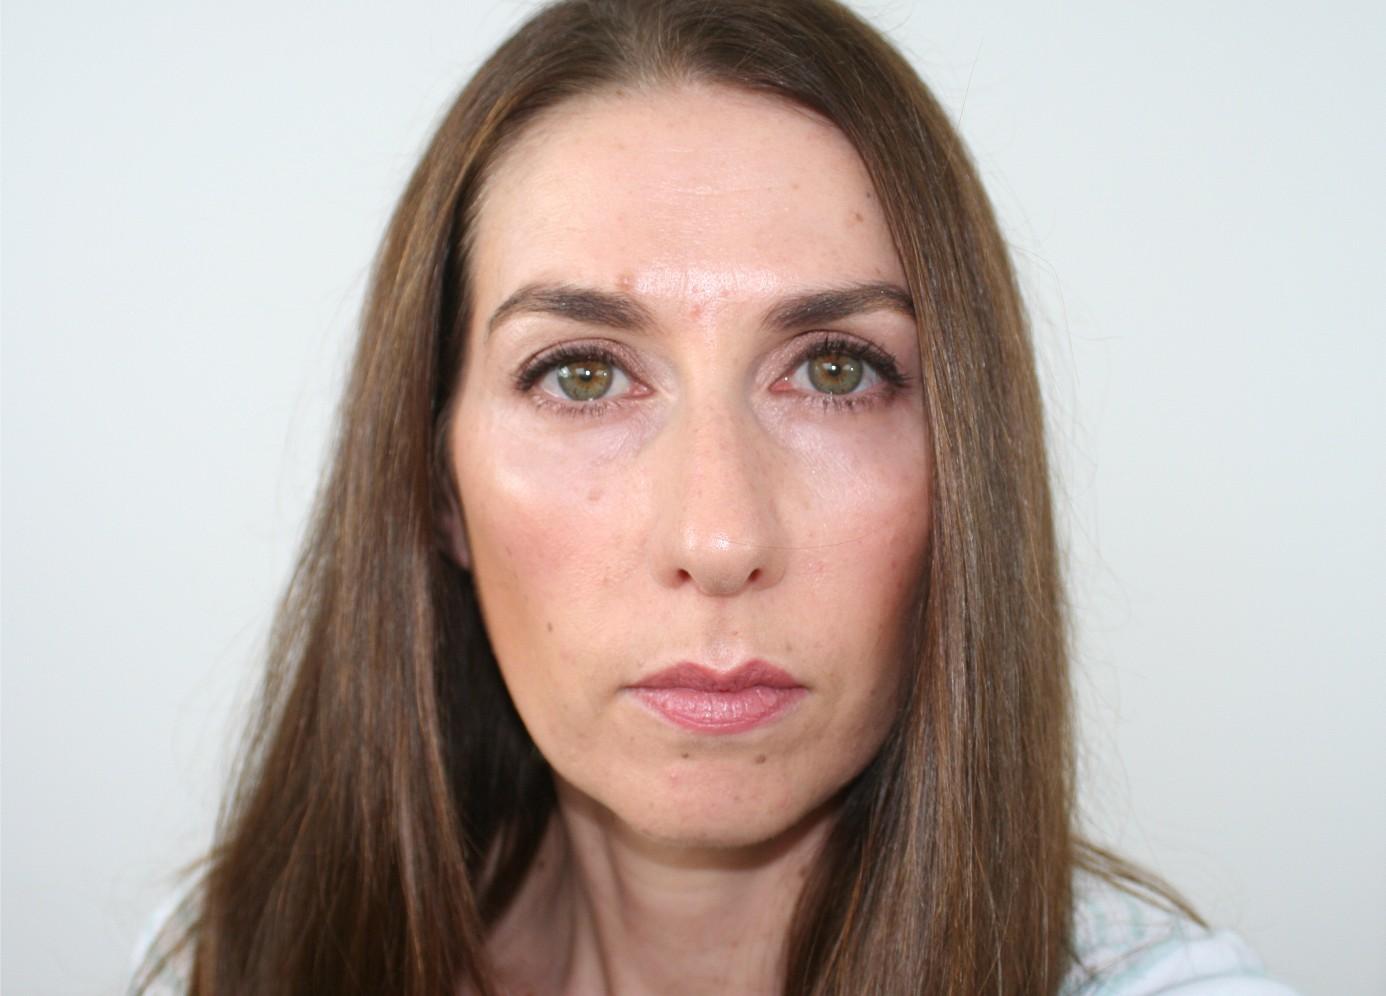 After - having contoured and highlighted around my cheekbones